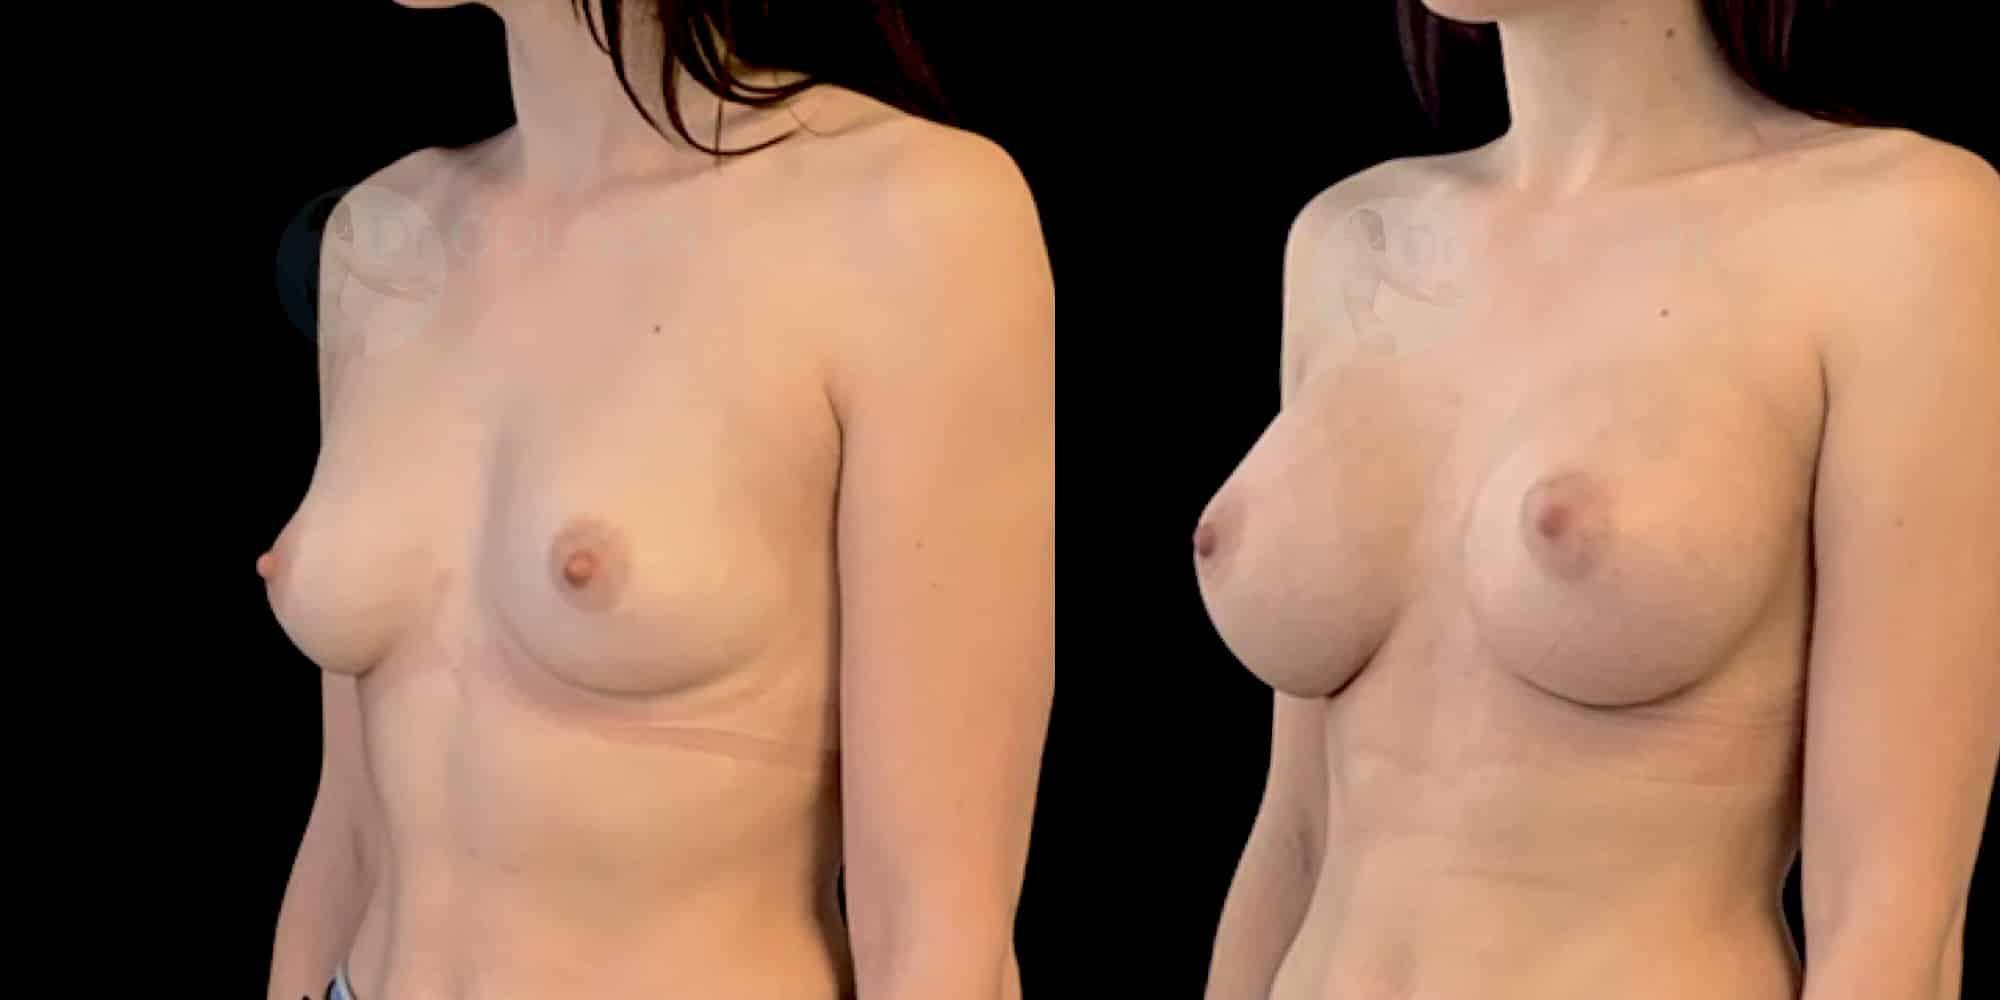 Dr Colson - Chirurgie sein - Augmentation Mammaire Trois Quart